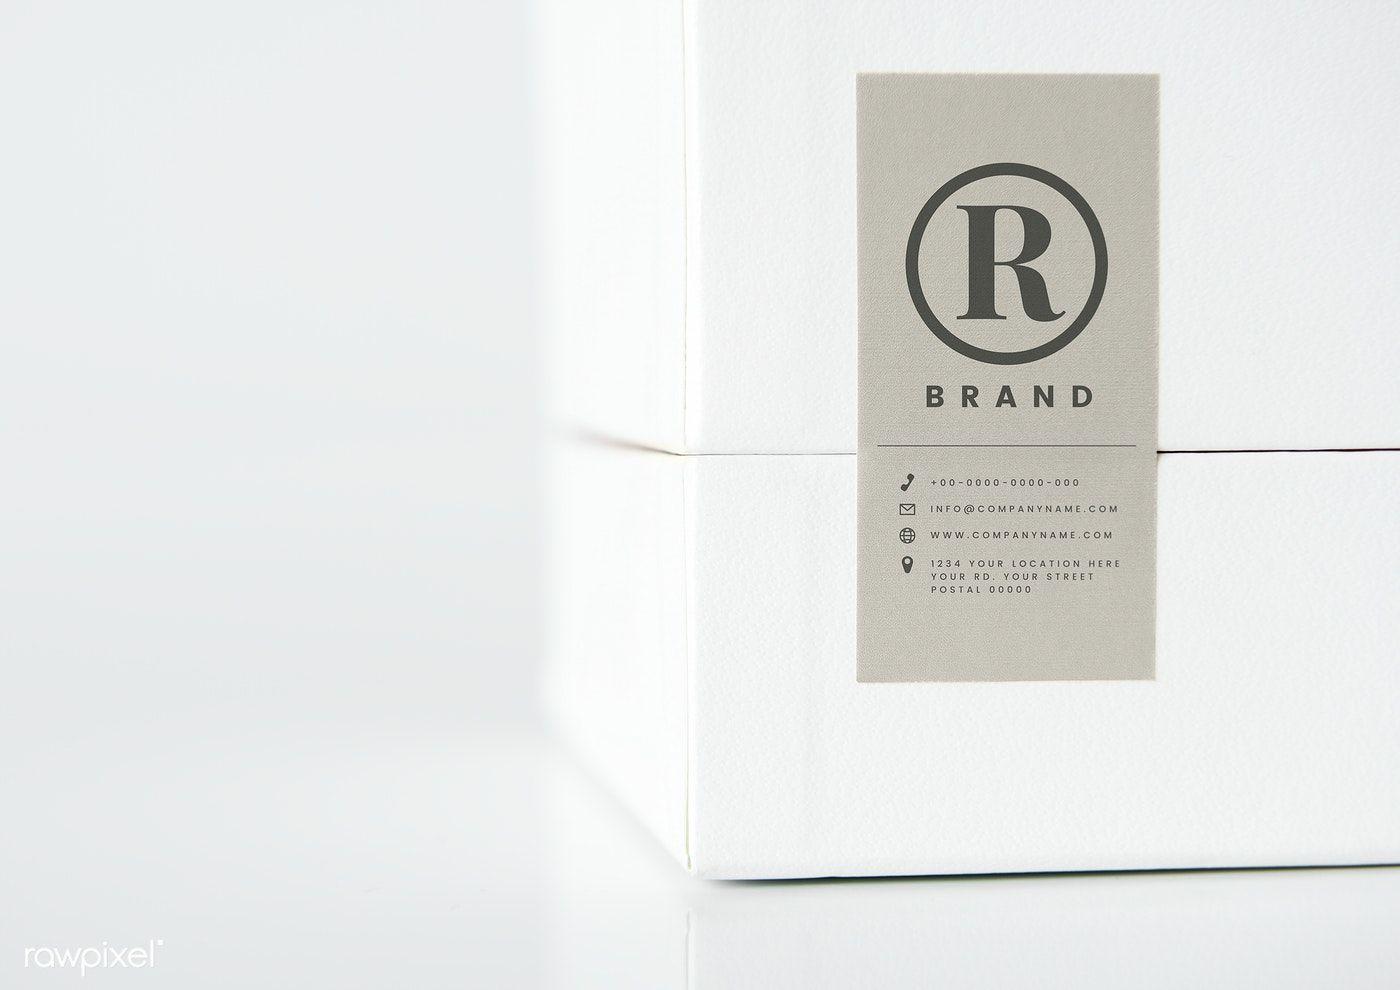 Download Download Premium Psd Of Simple White Packaging Box Mockup 531859 Box Mockup Box Packaging Design Freebie